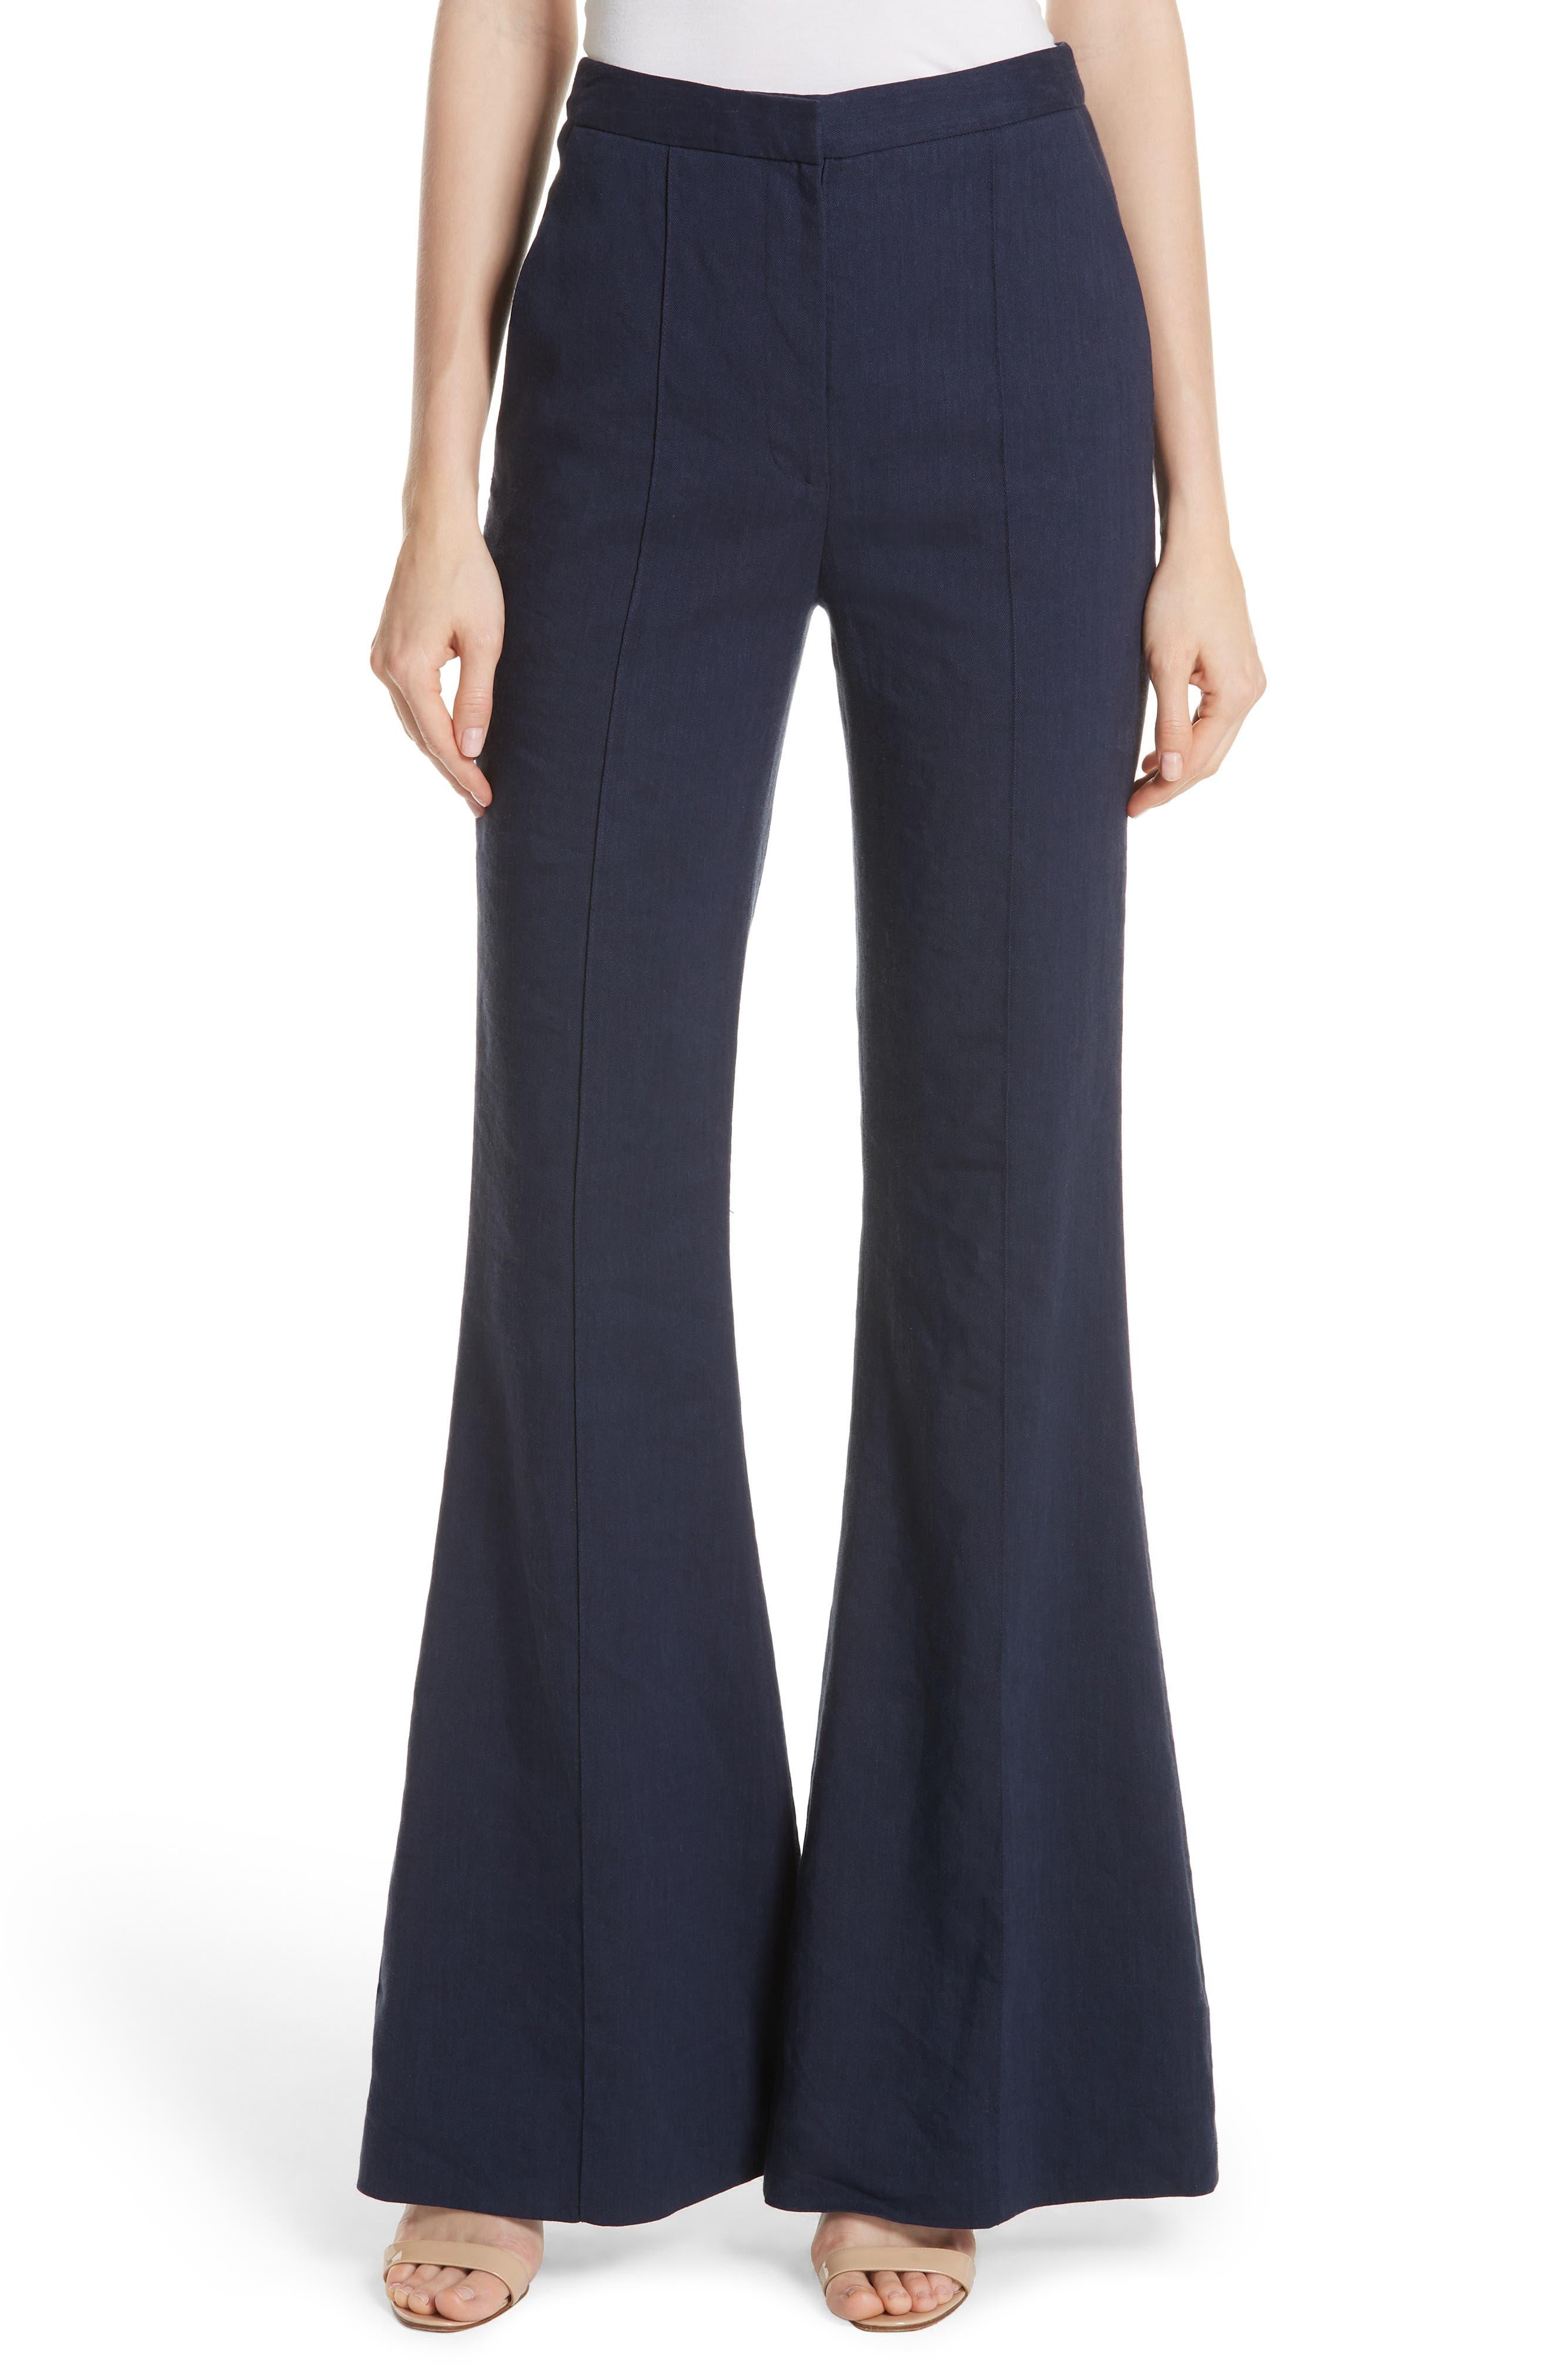 Diane von Furstenberg Pleat Front Flare Stretch Linen Blend Pants,                             Main thumbnail 1, color,                             New Navy